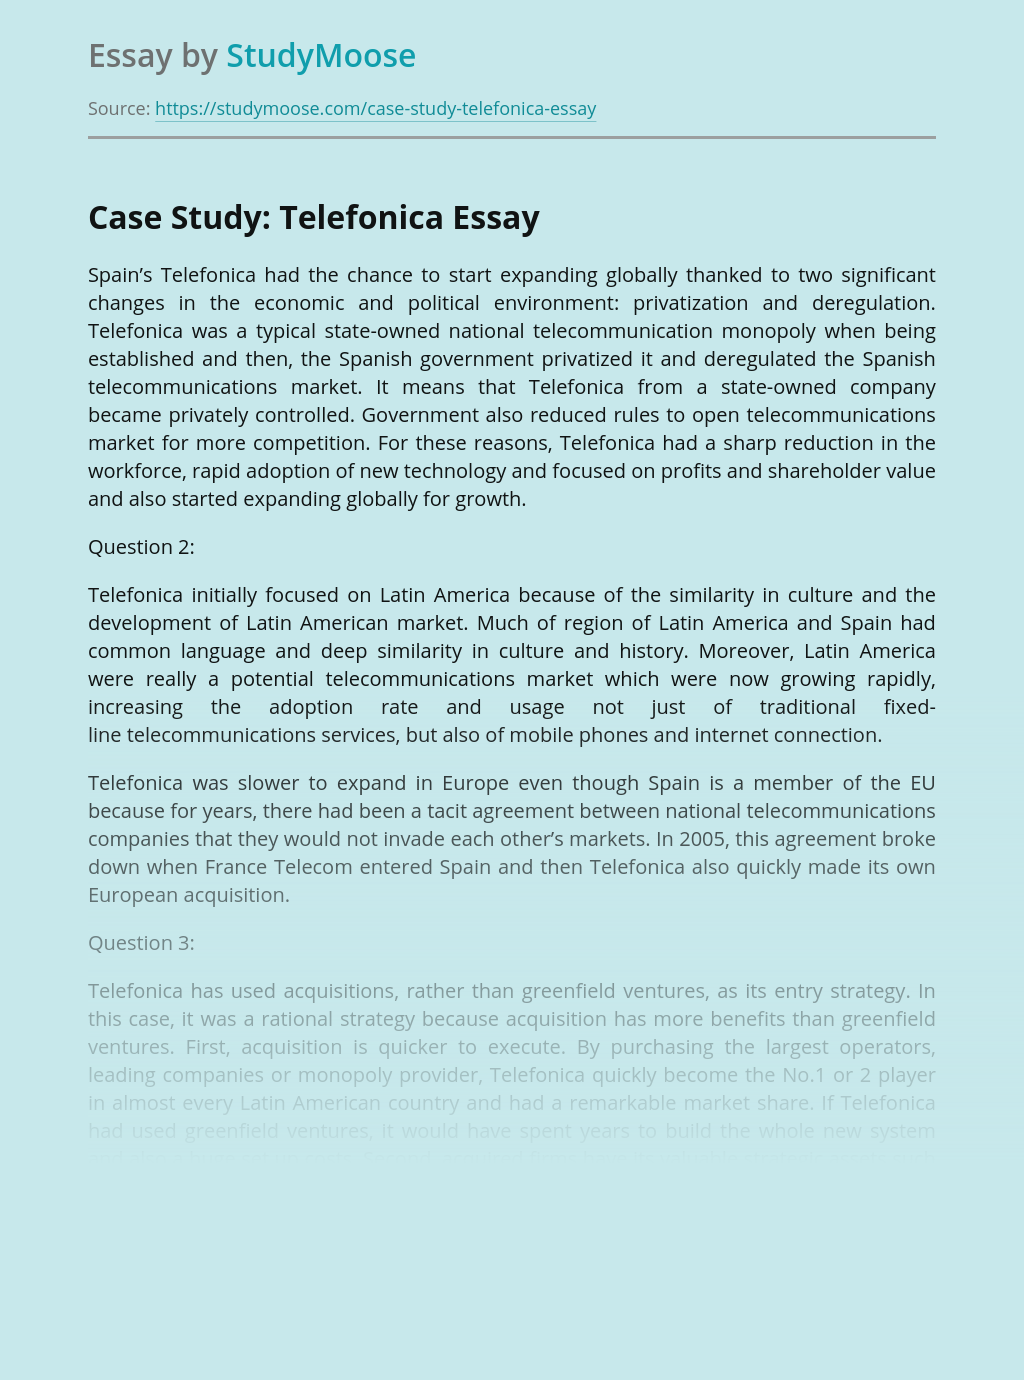 Case Study: Telefonica